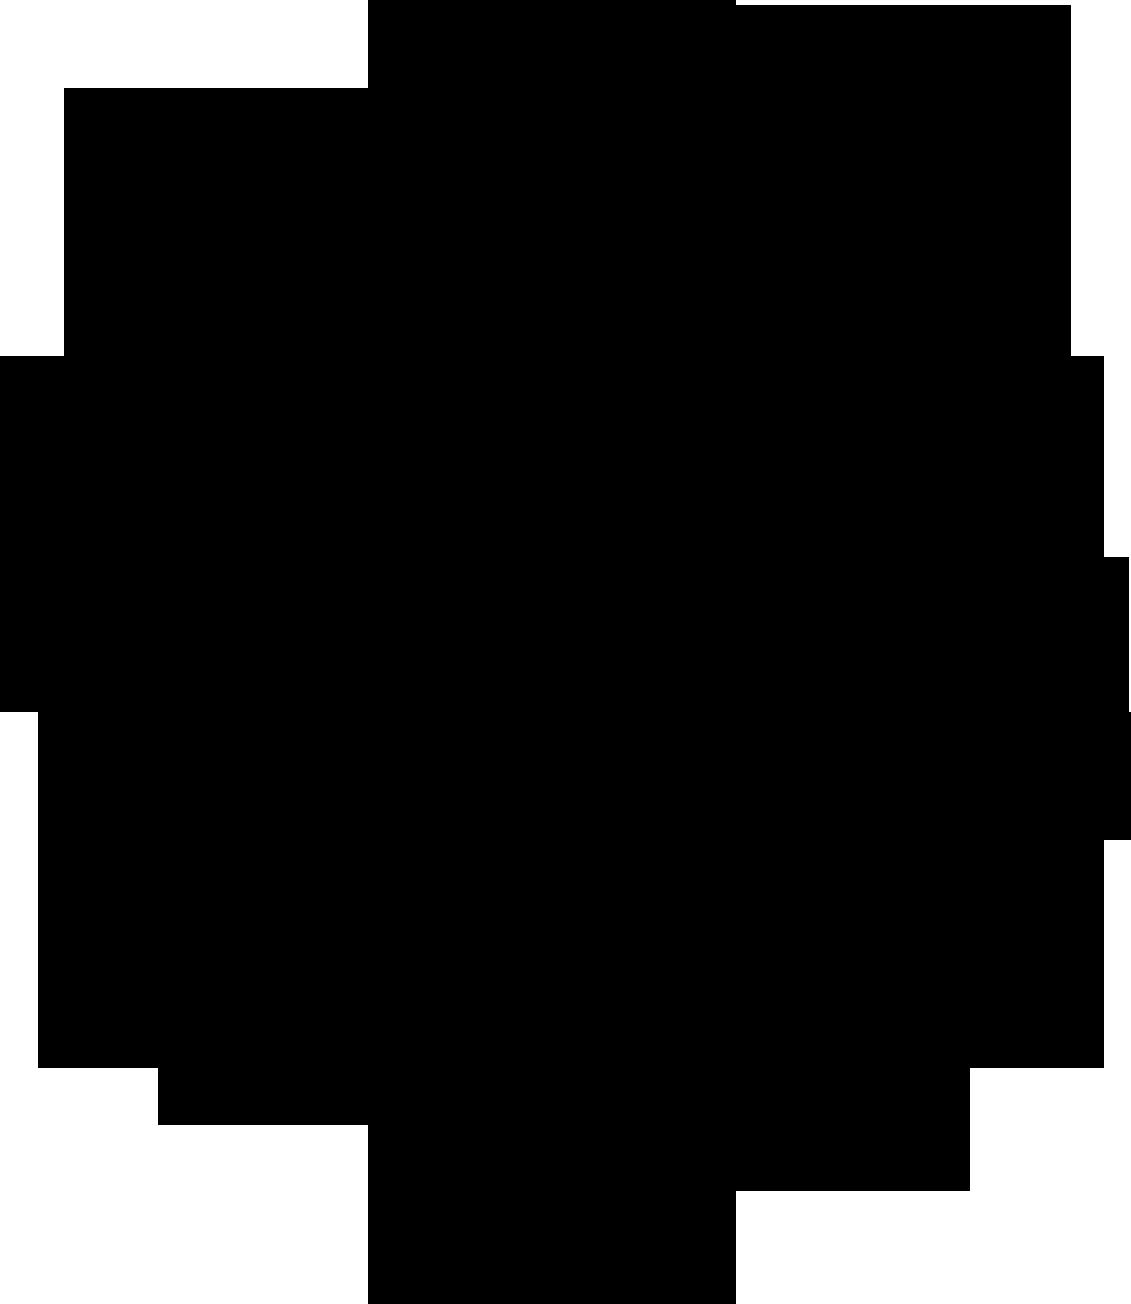 Charlielogoblack